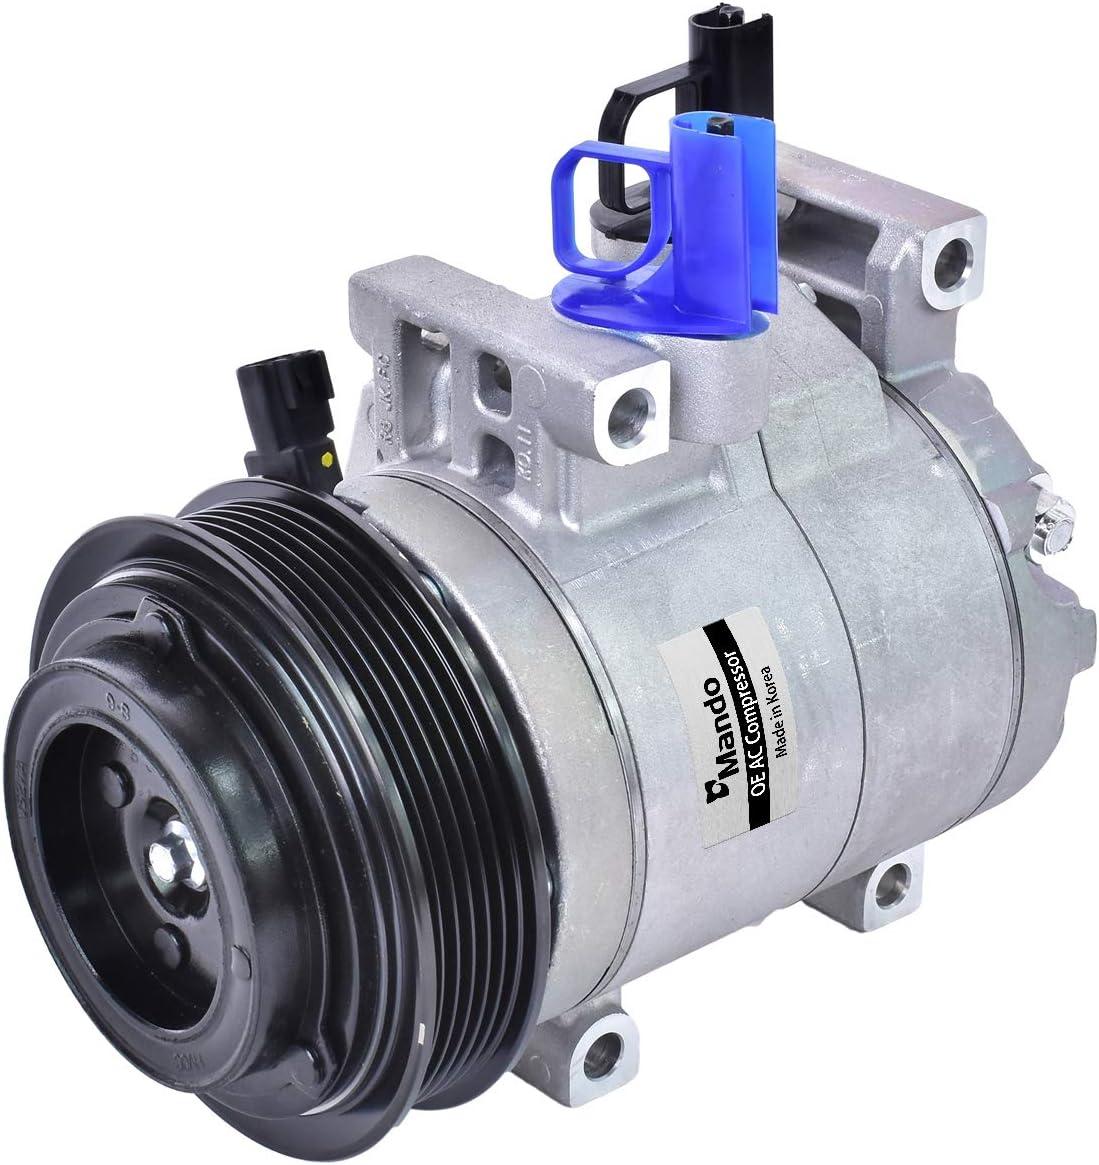 New Mando 10A1442 AC Complete Free Shipping Compressor Equipment unisex Clutch with Original